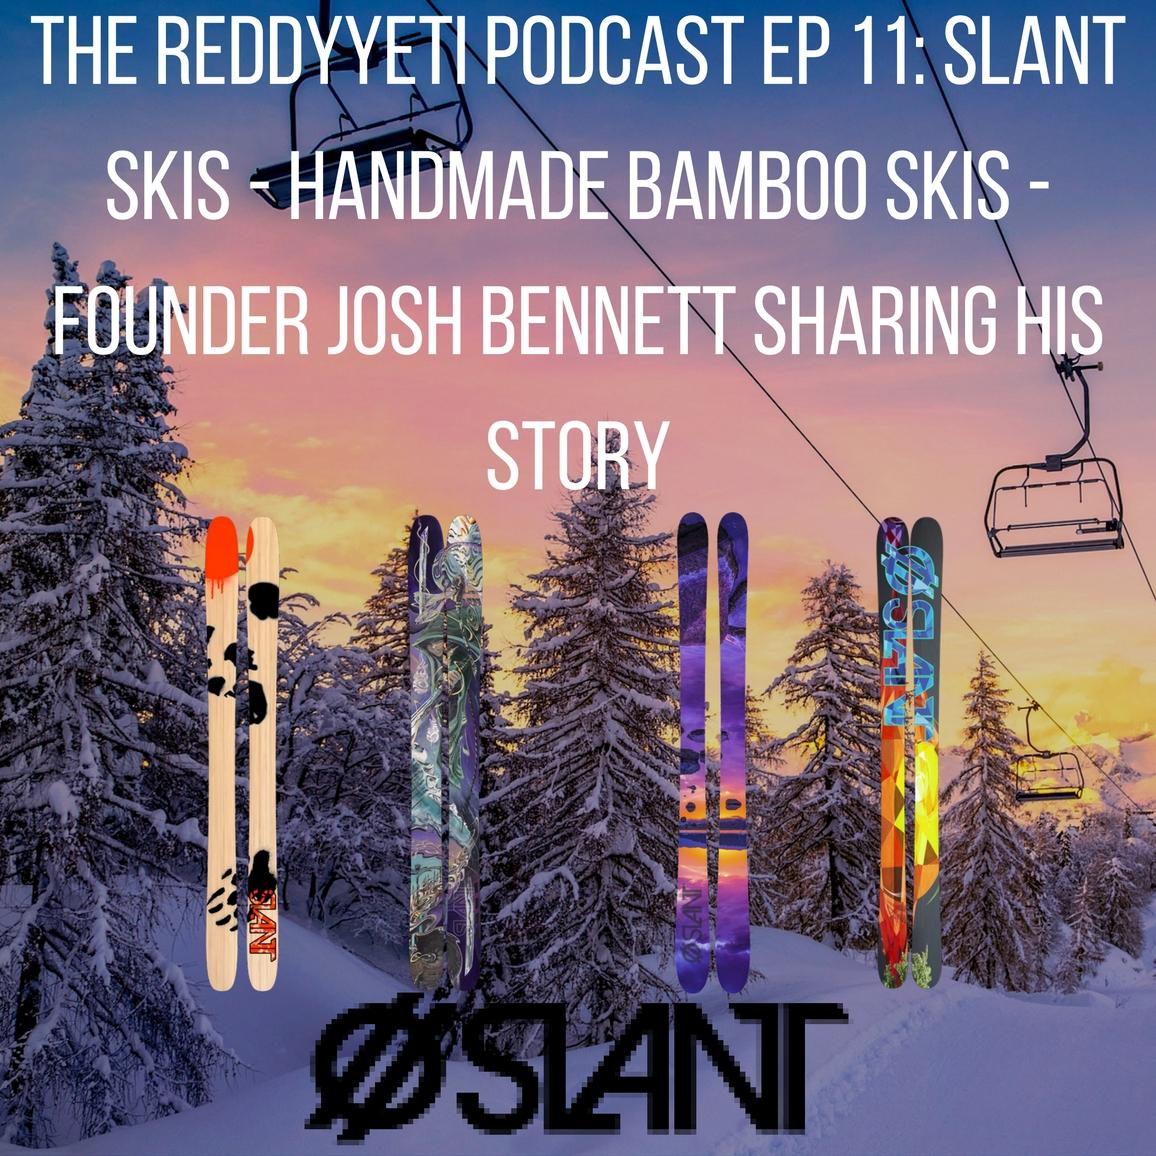 Slant Podcast Image.jpg